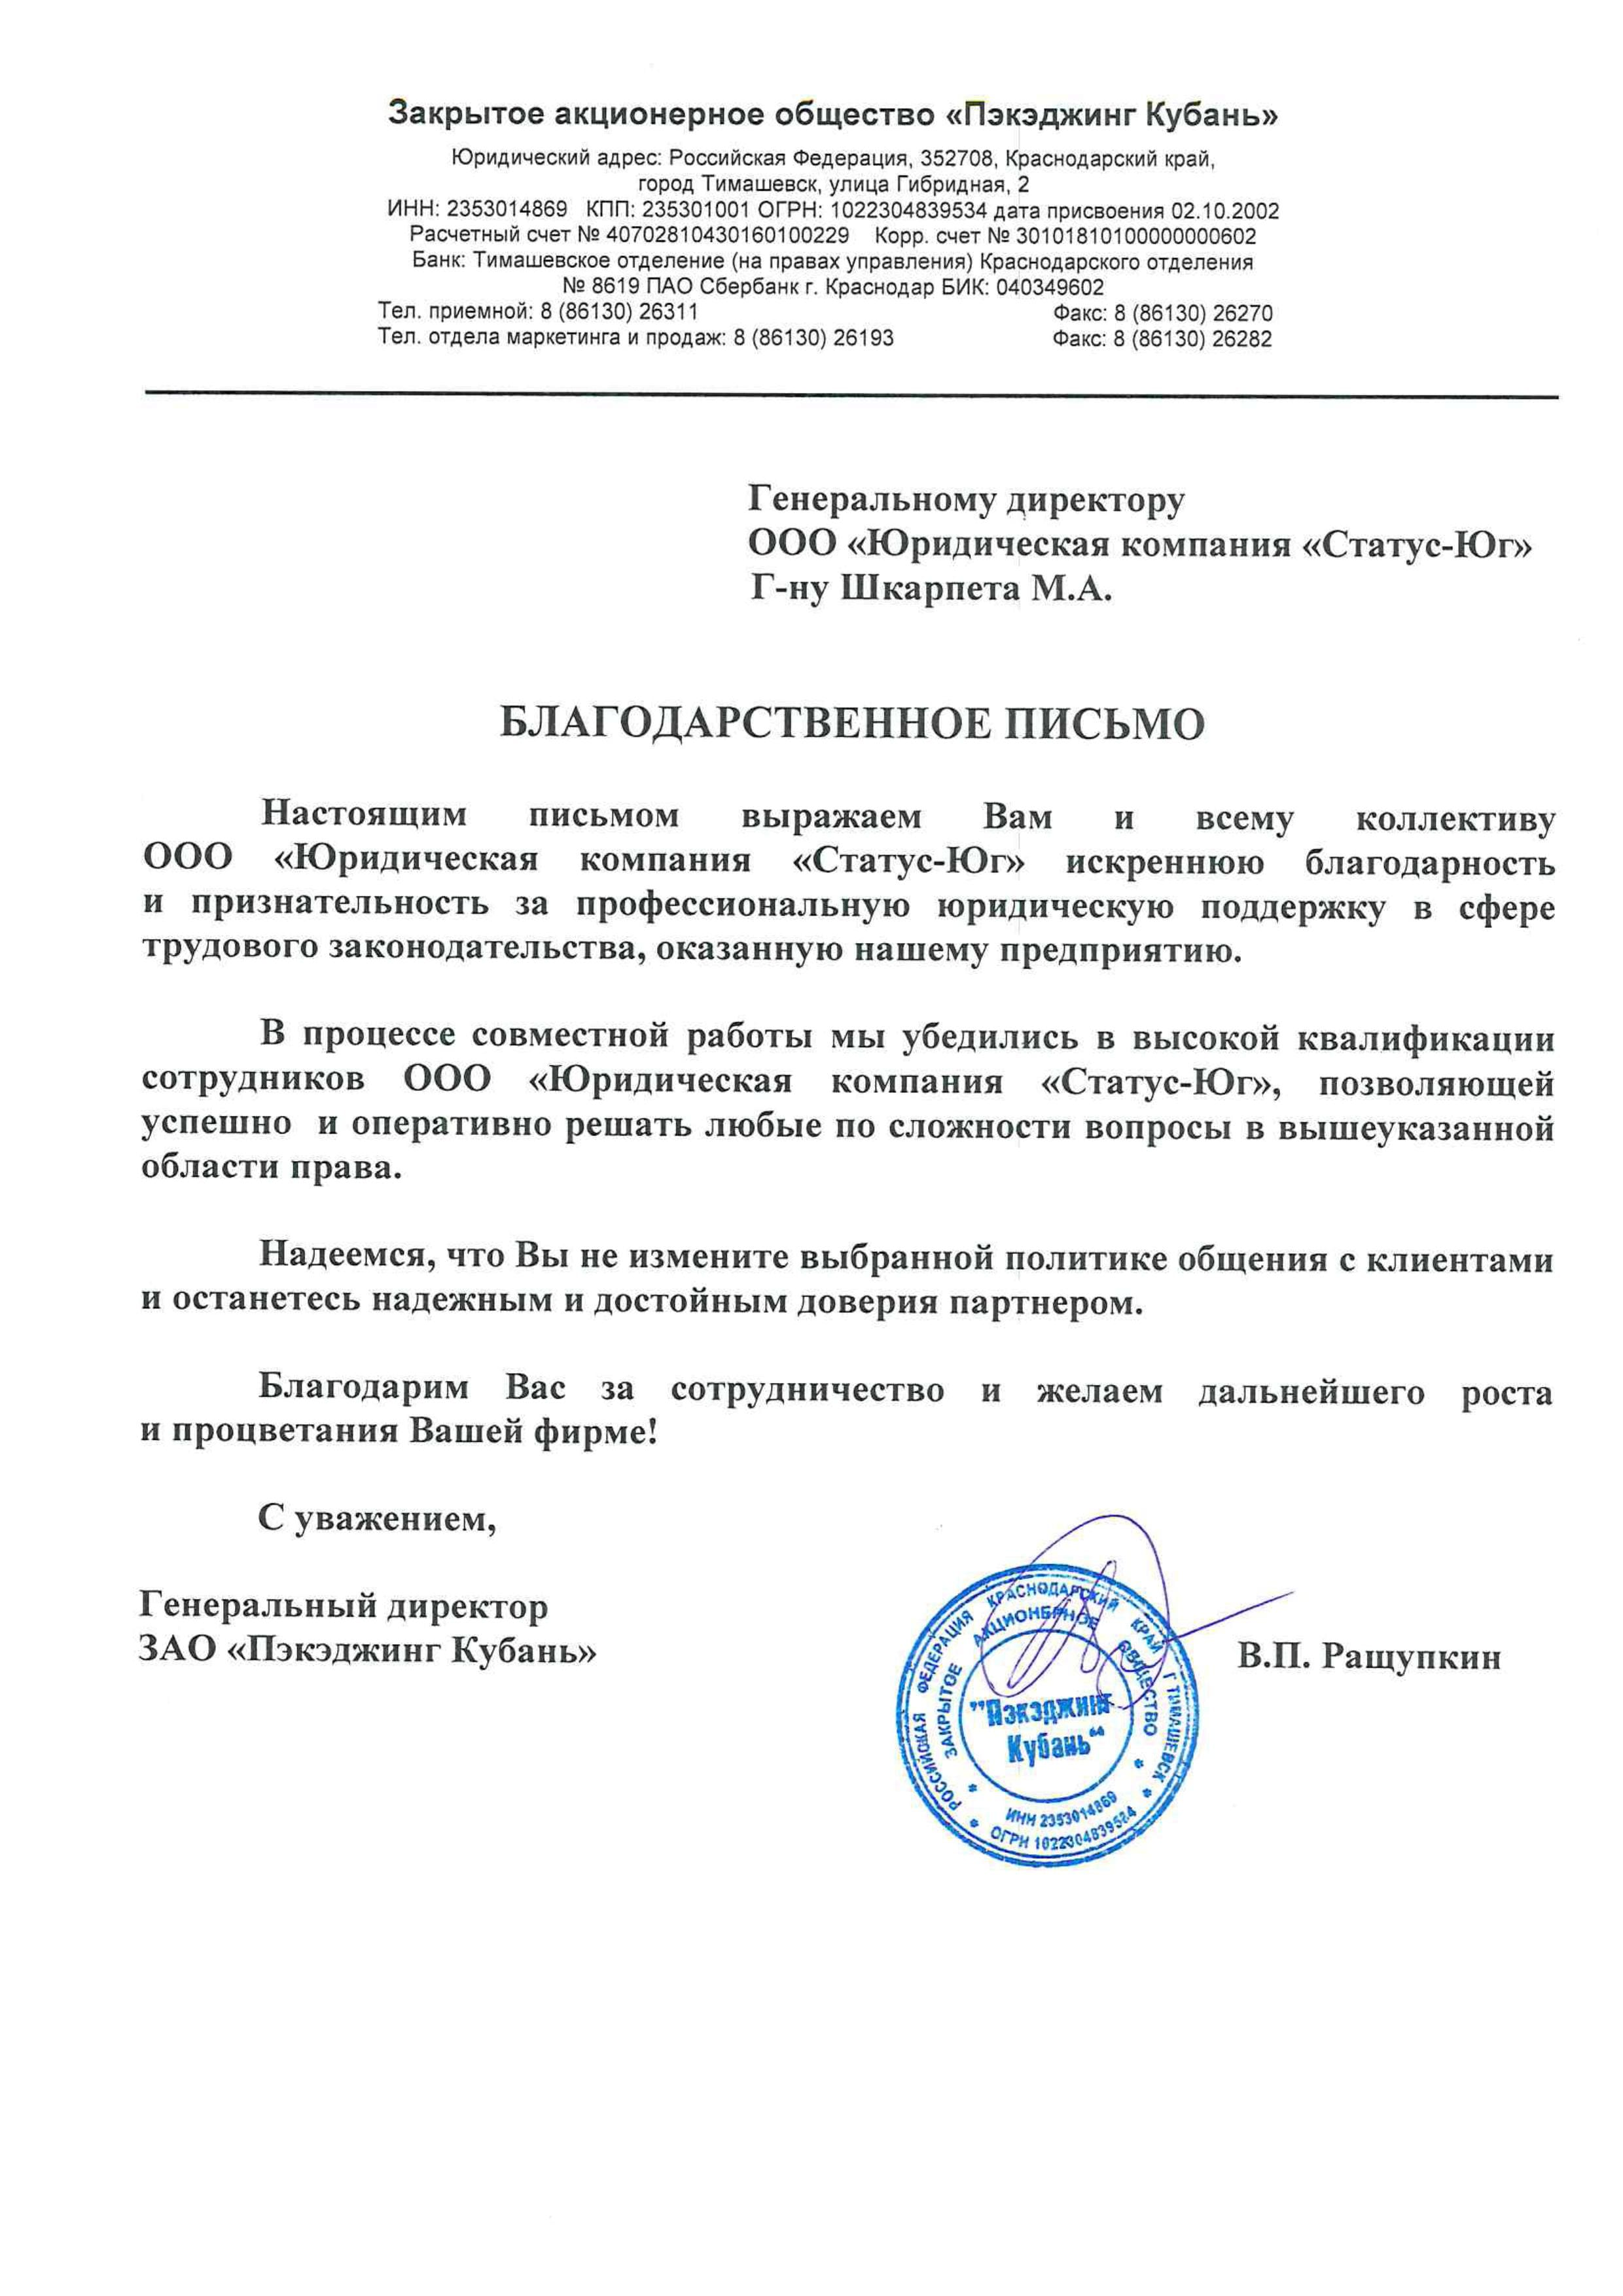 ЗАО Пэкэджинг Кубань